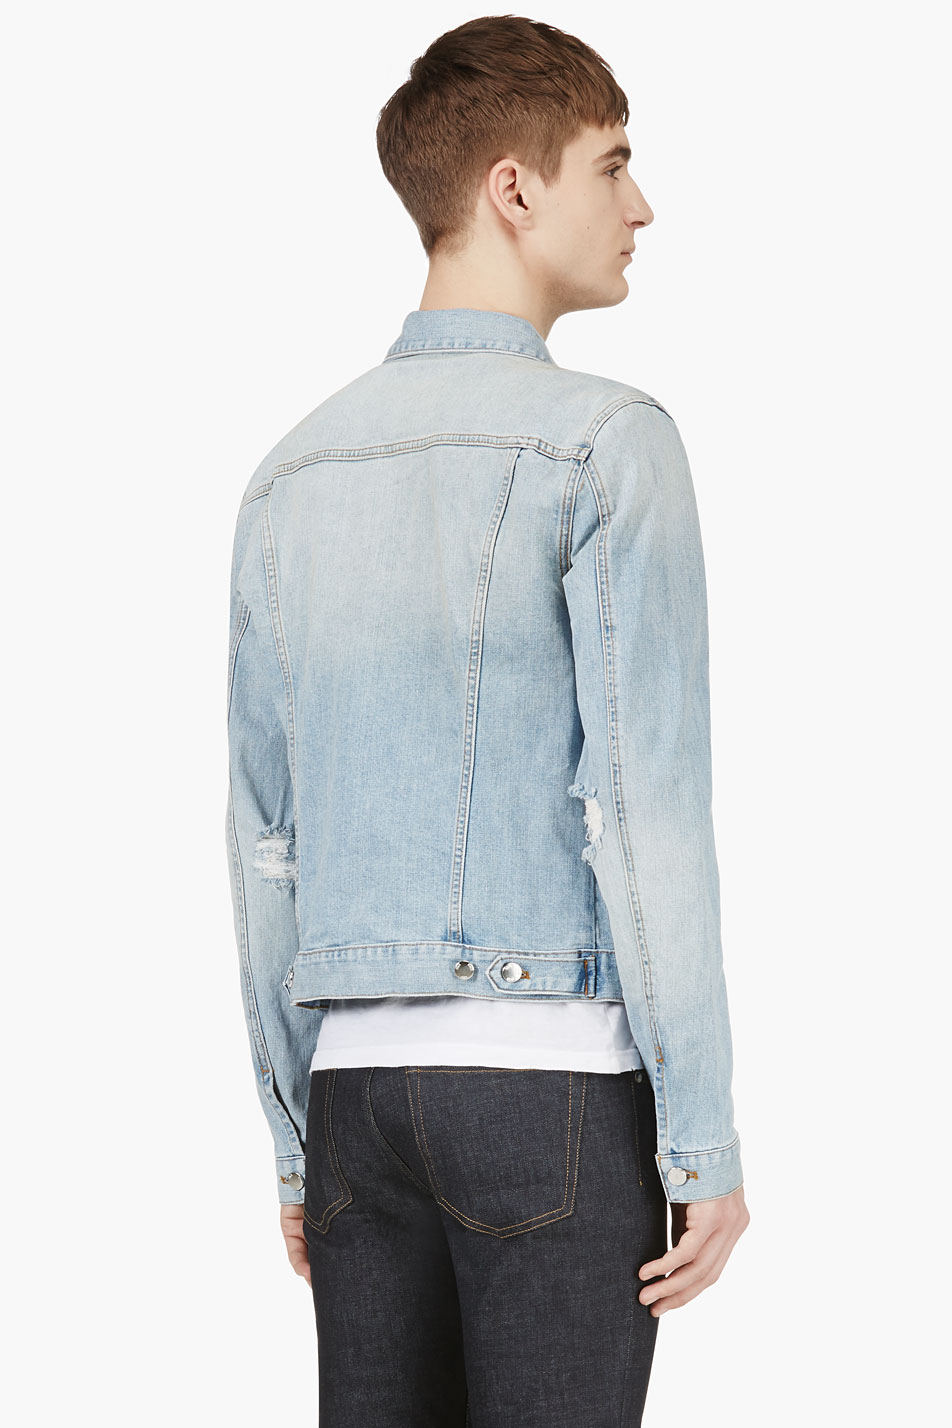 Blk dnm Light Blue Faded Denim Jacket in Blue for Men | Lyst